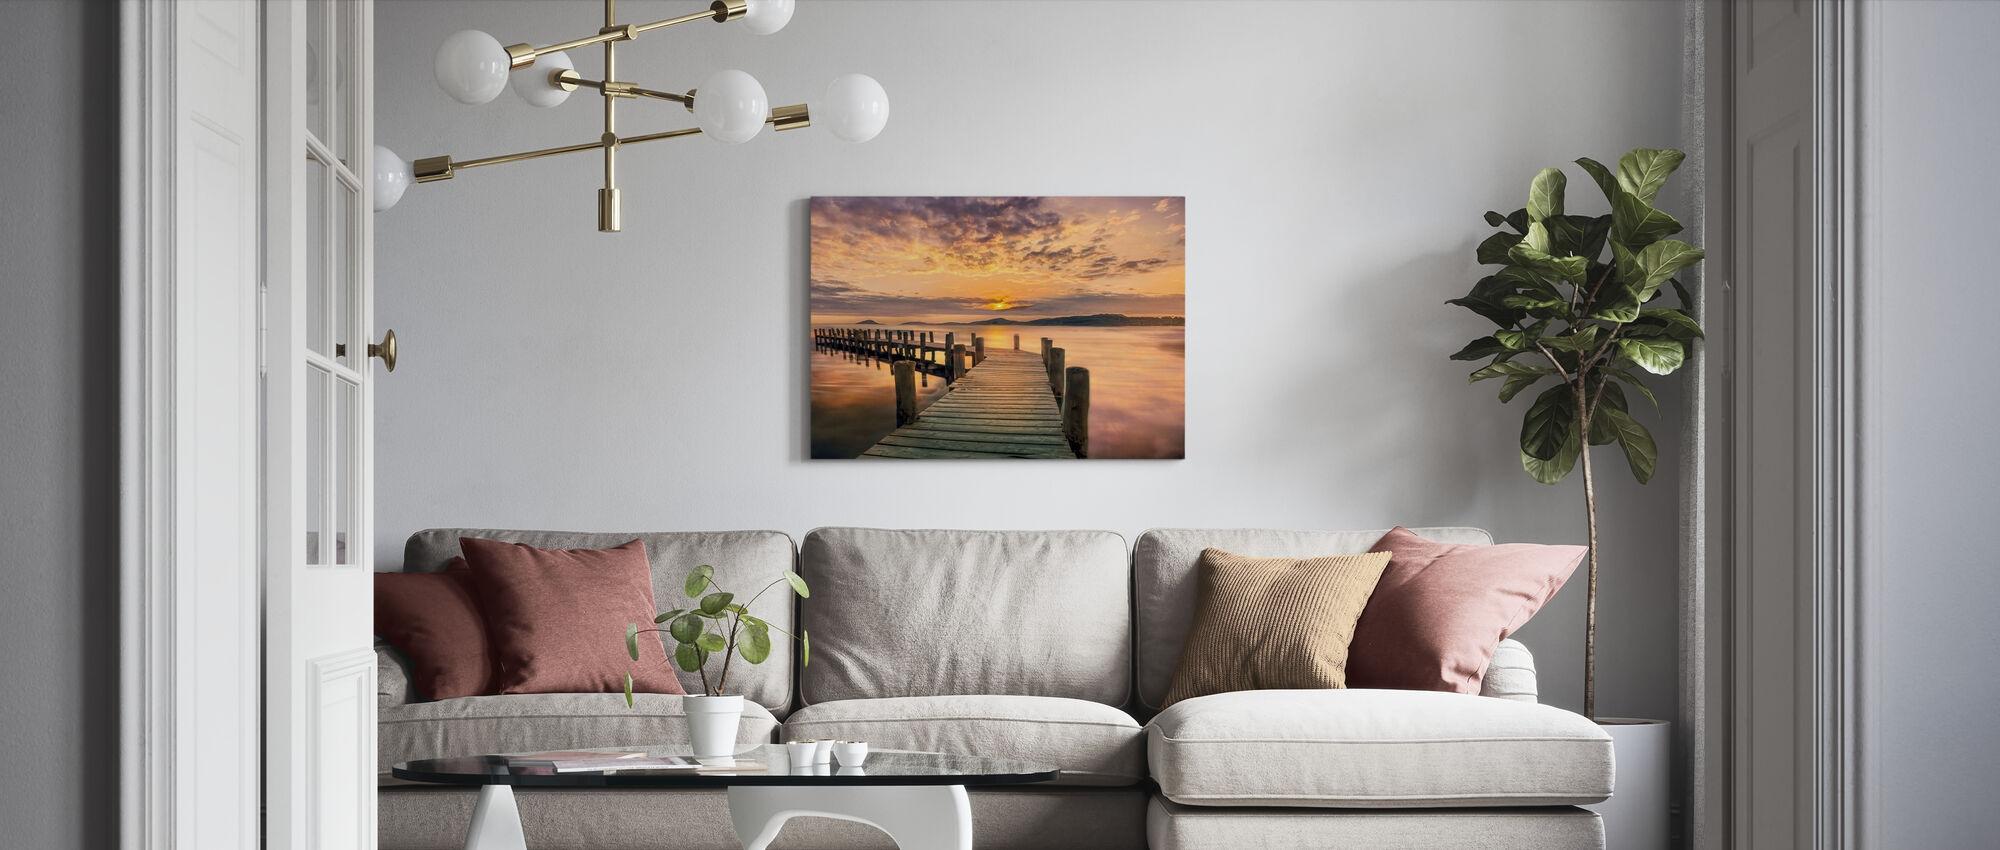 Pier i solnedgang - Lerretsbilde - Stue